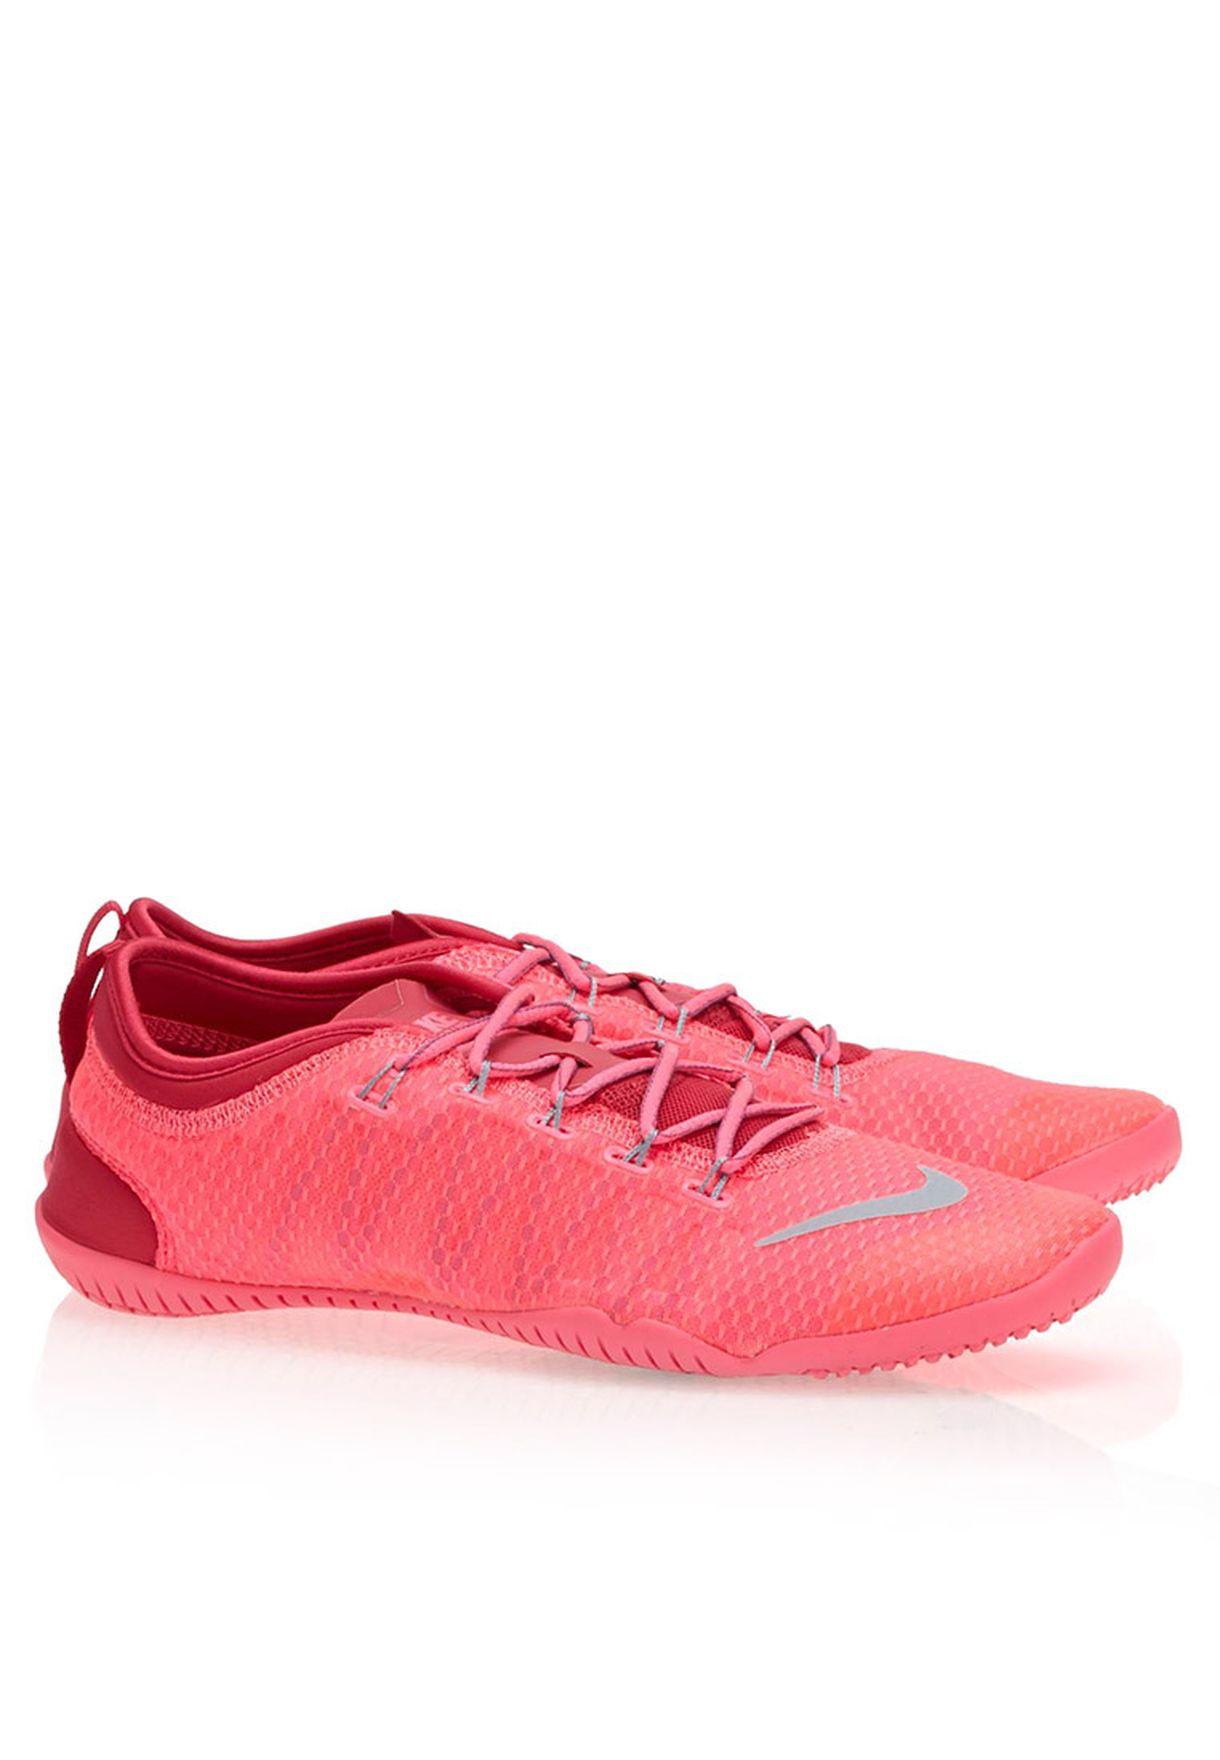 36aa64b15a82b Shop Nike pink Free 1.0 Cross Bionic 641530-601 for Women in UAE ...